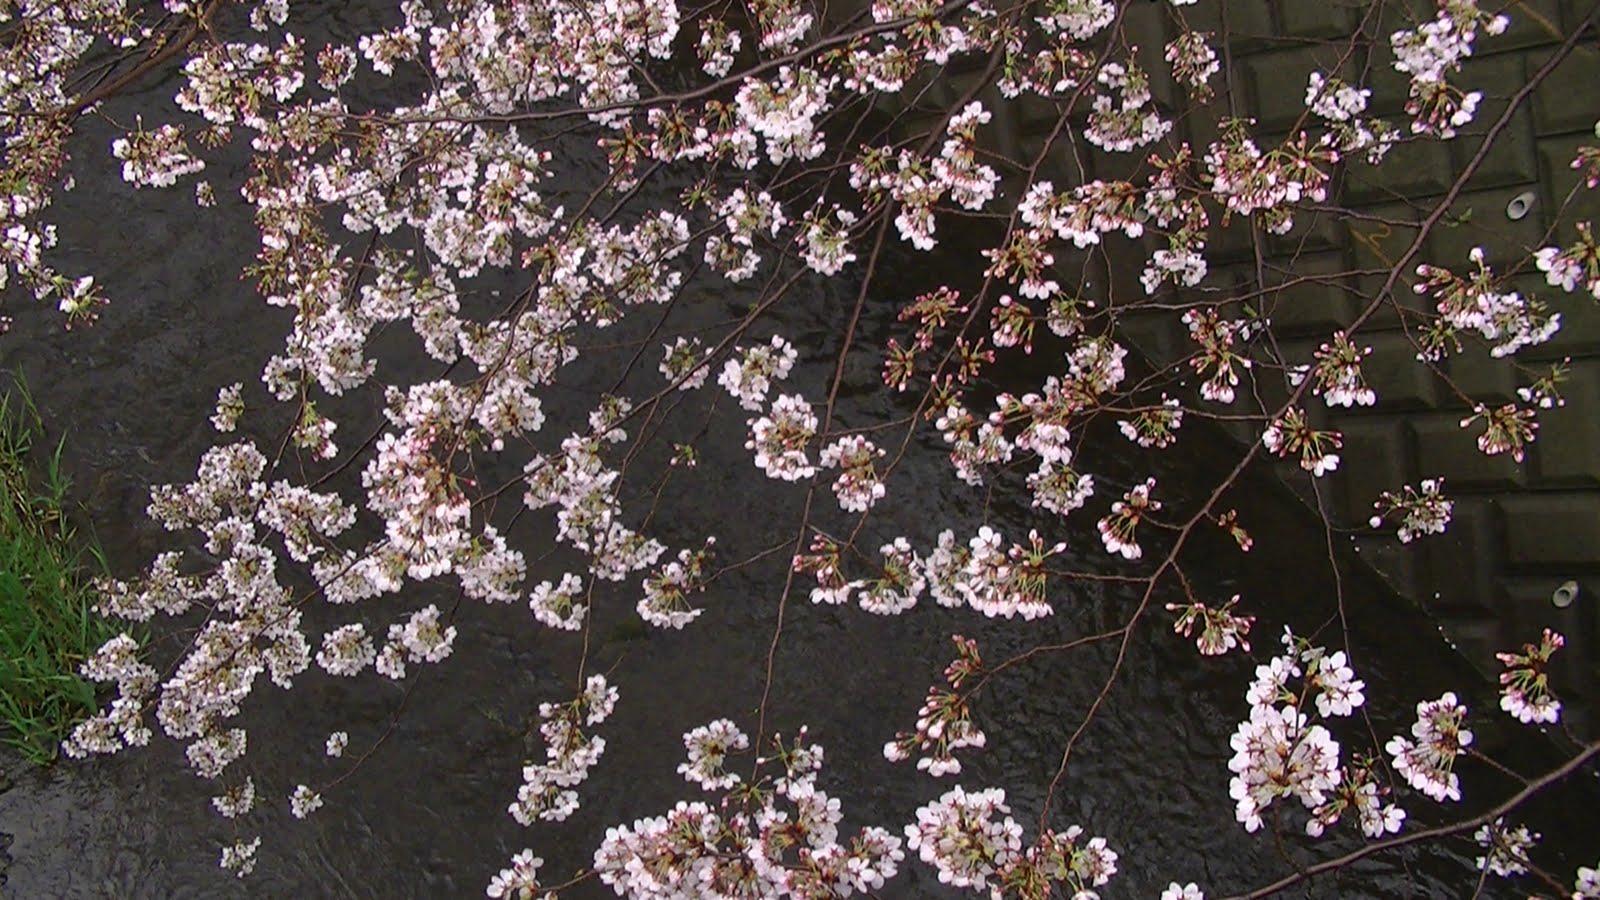 Drawn sakura blossom flower cluster When is clusters yokohamamama: quite